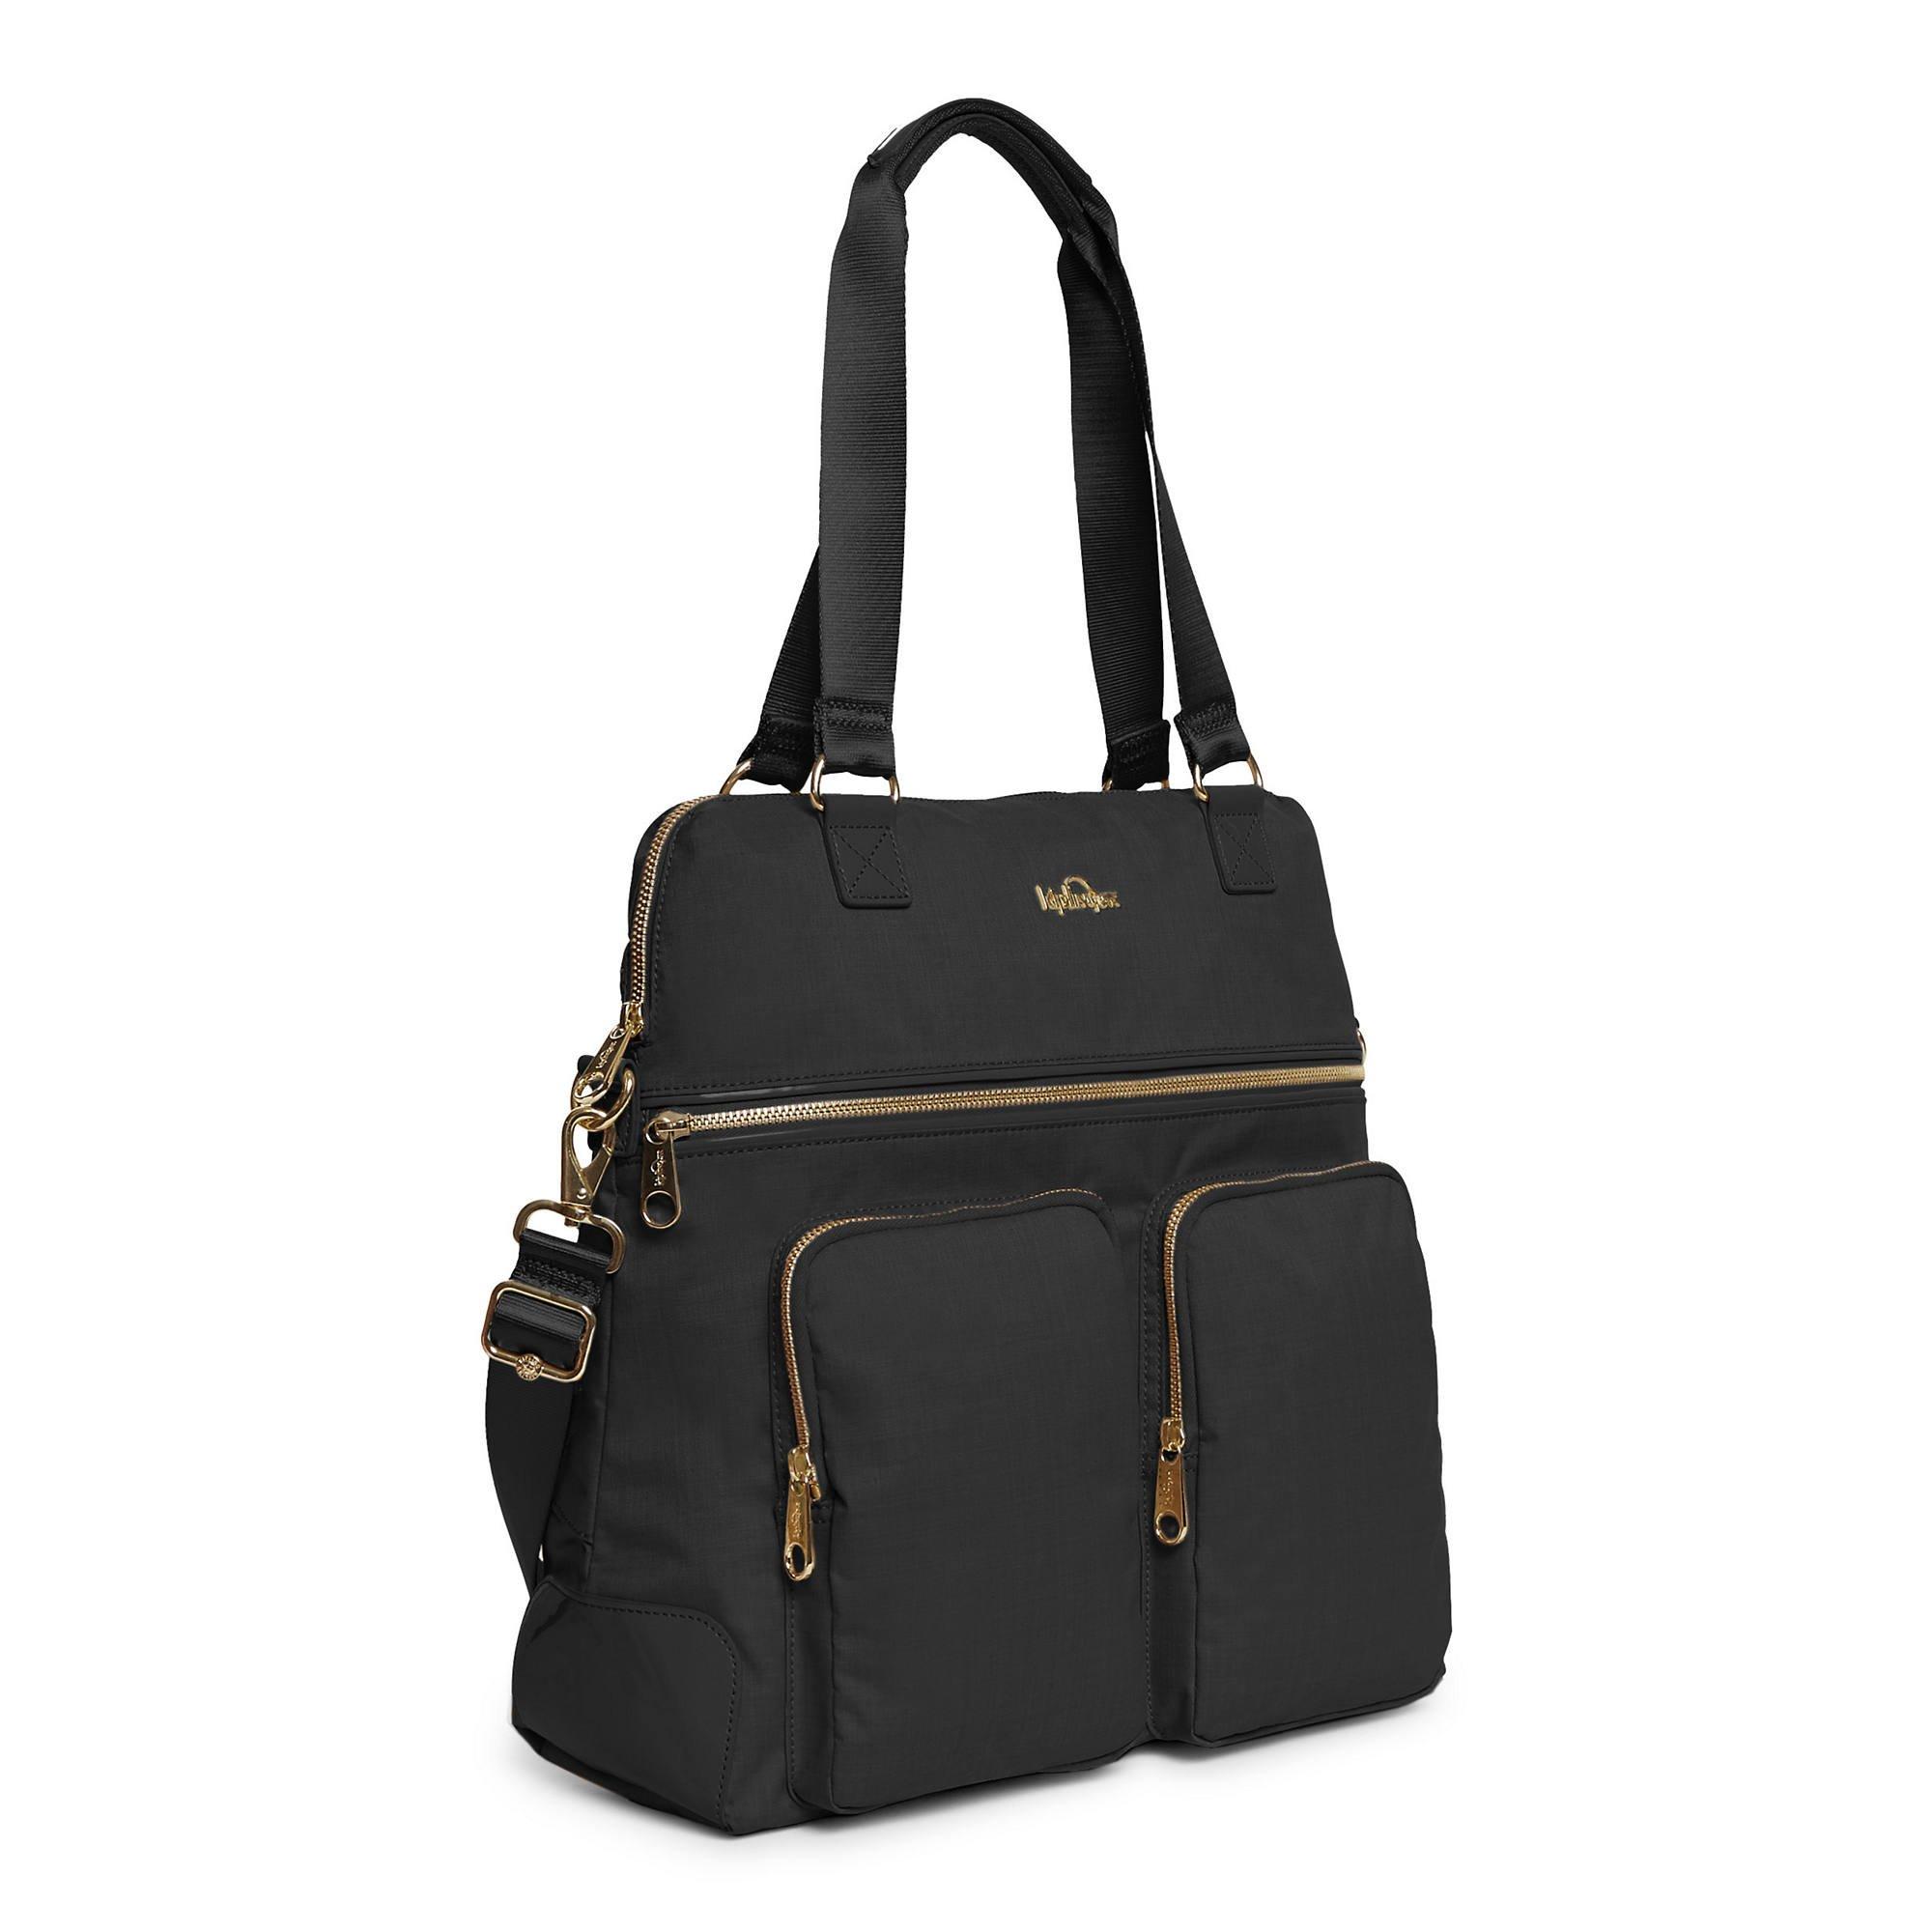 Kipling Camryn Laptop Handbag Black Crosshatch by Kipling (Image #2)